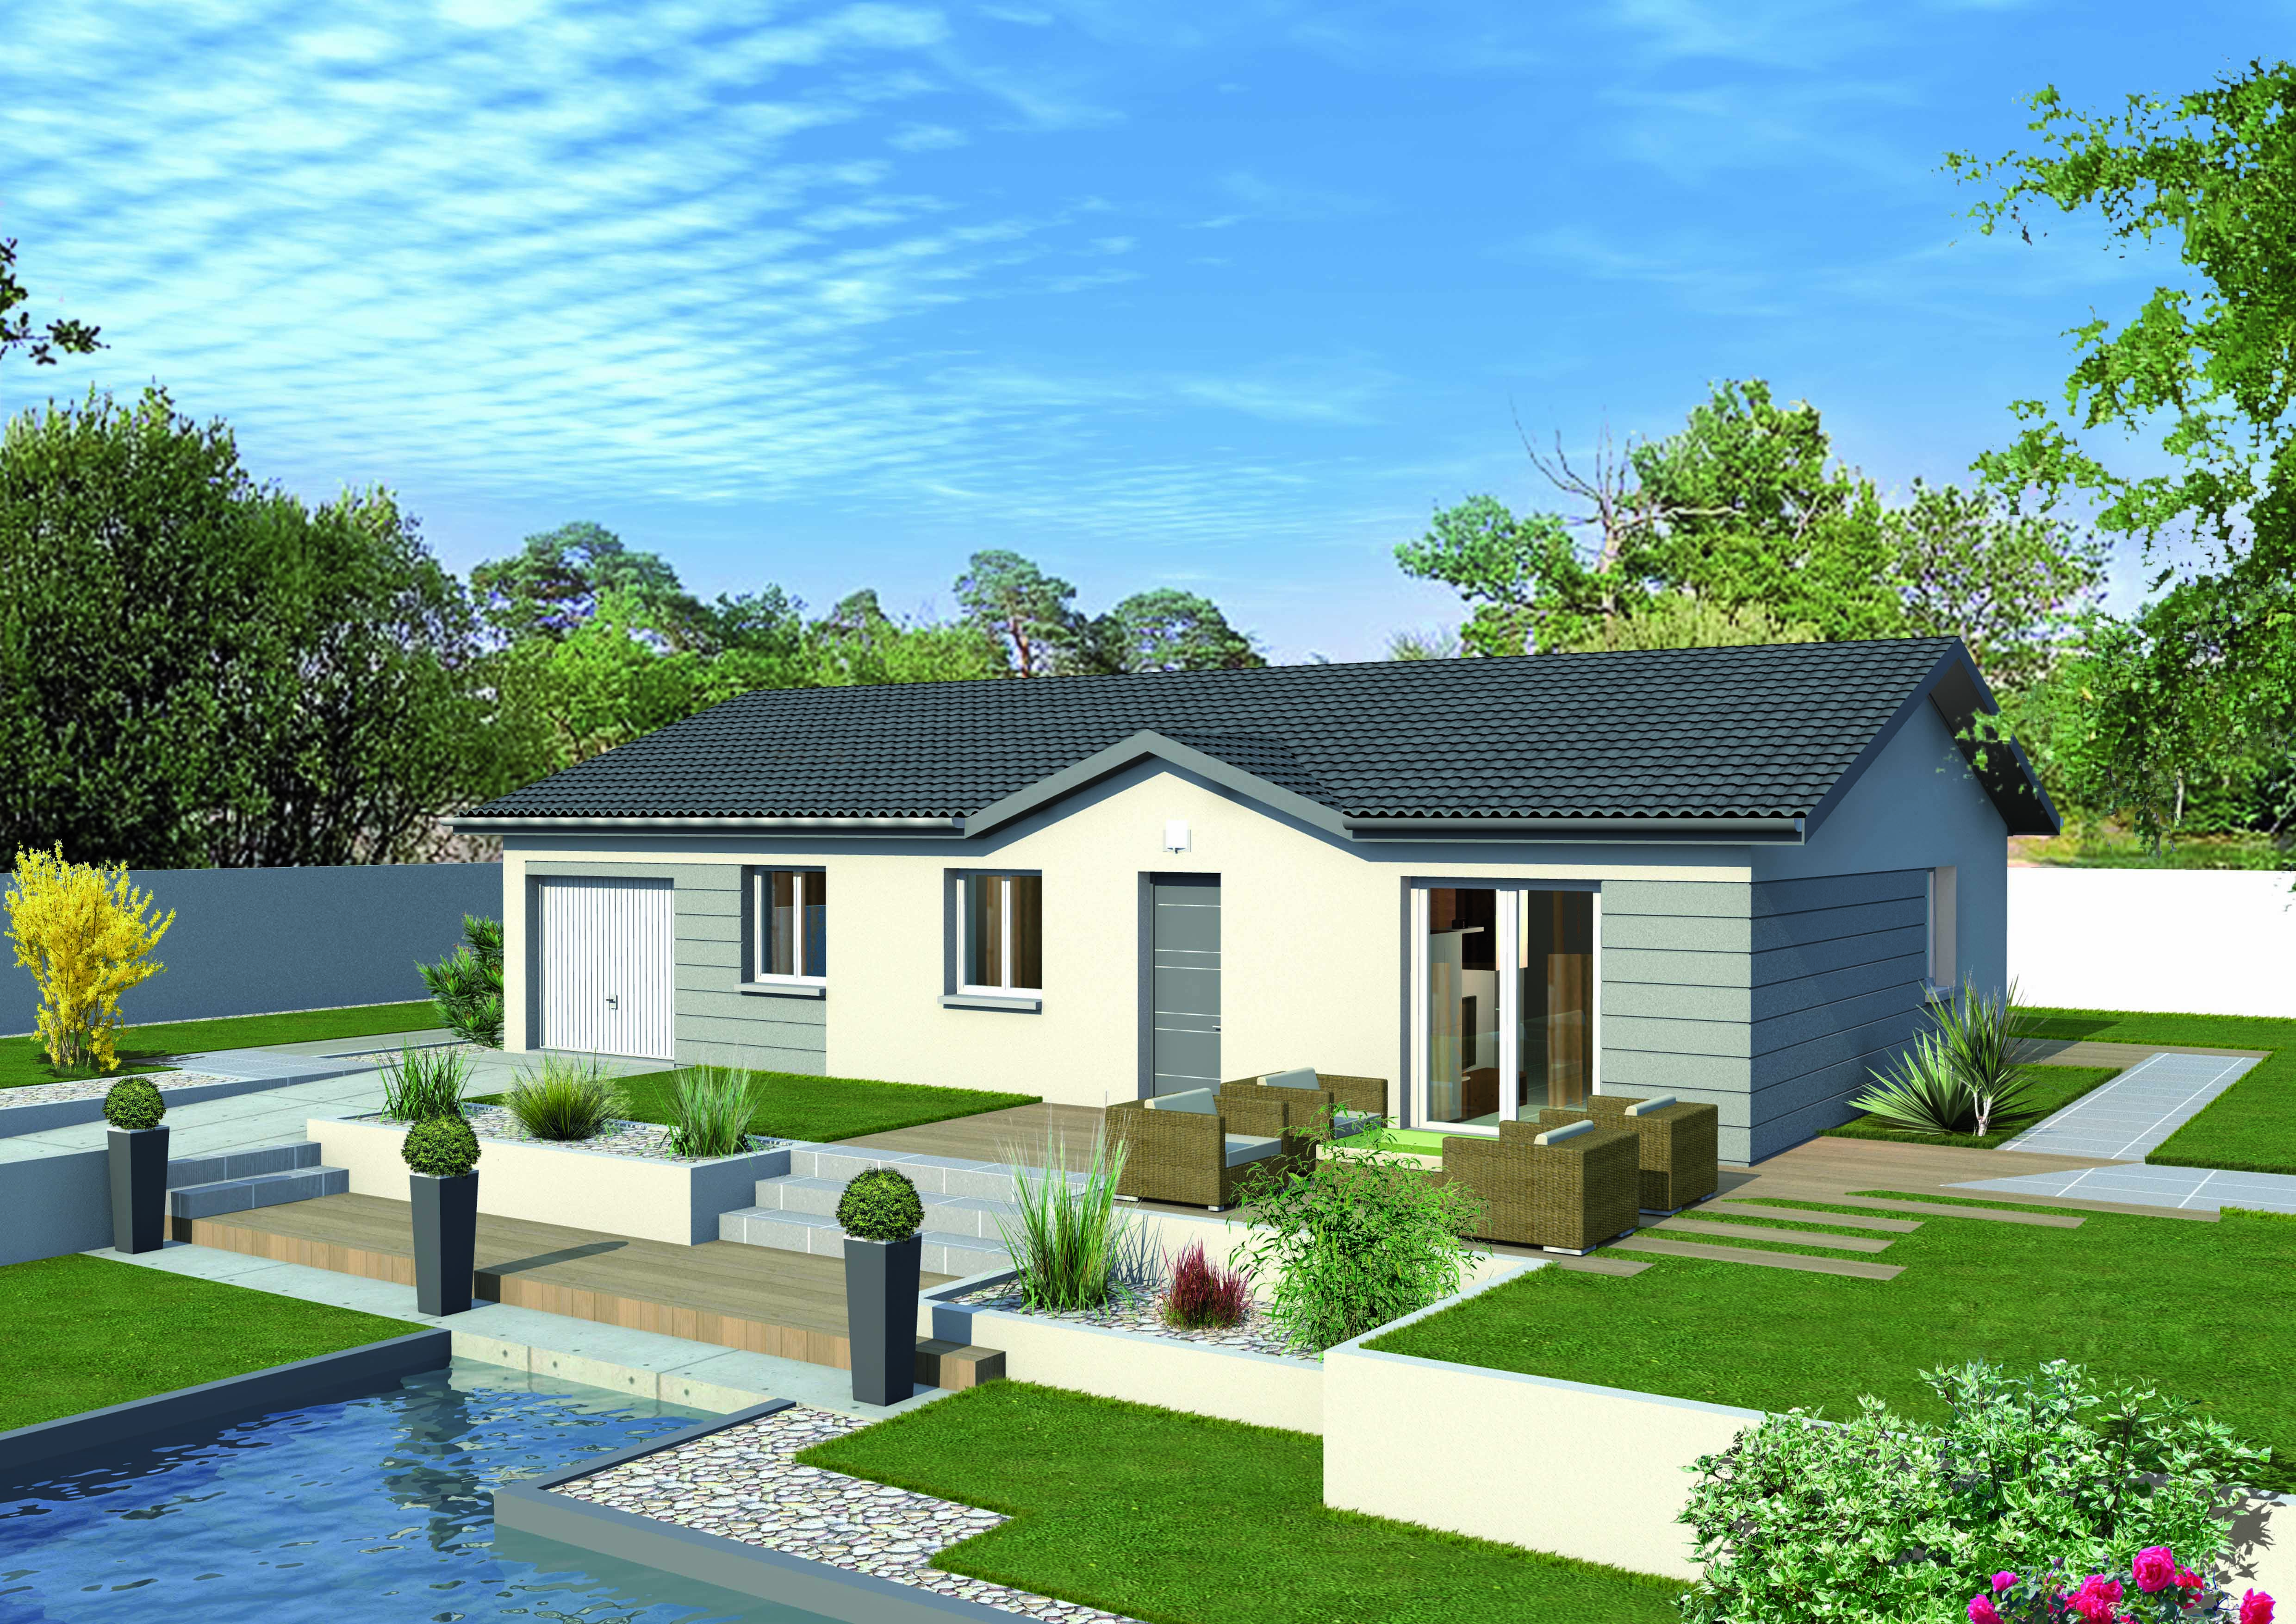 Maisons + Terrains du constructeur MAISONS PUNCH BOURGOIN • 91 m² • GRANIEU